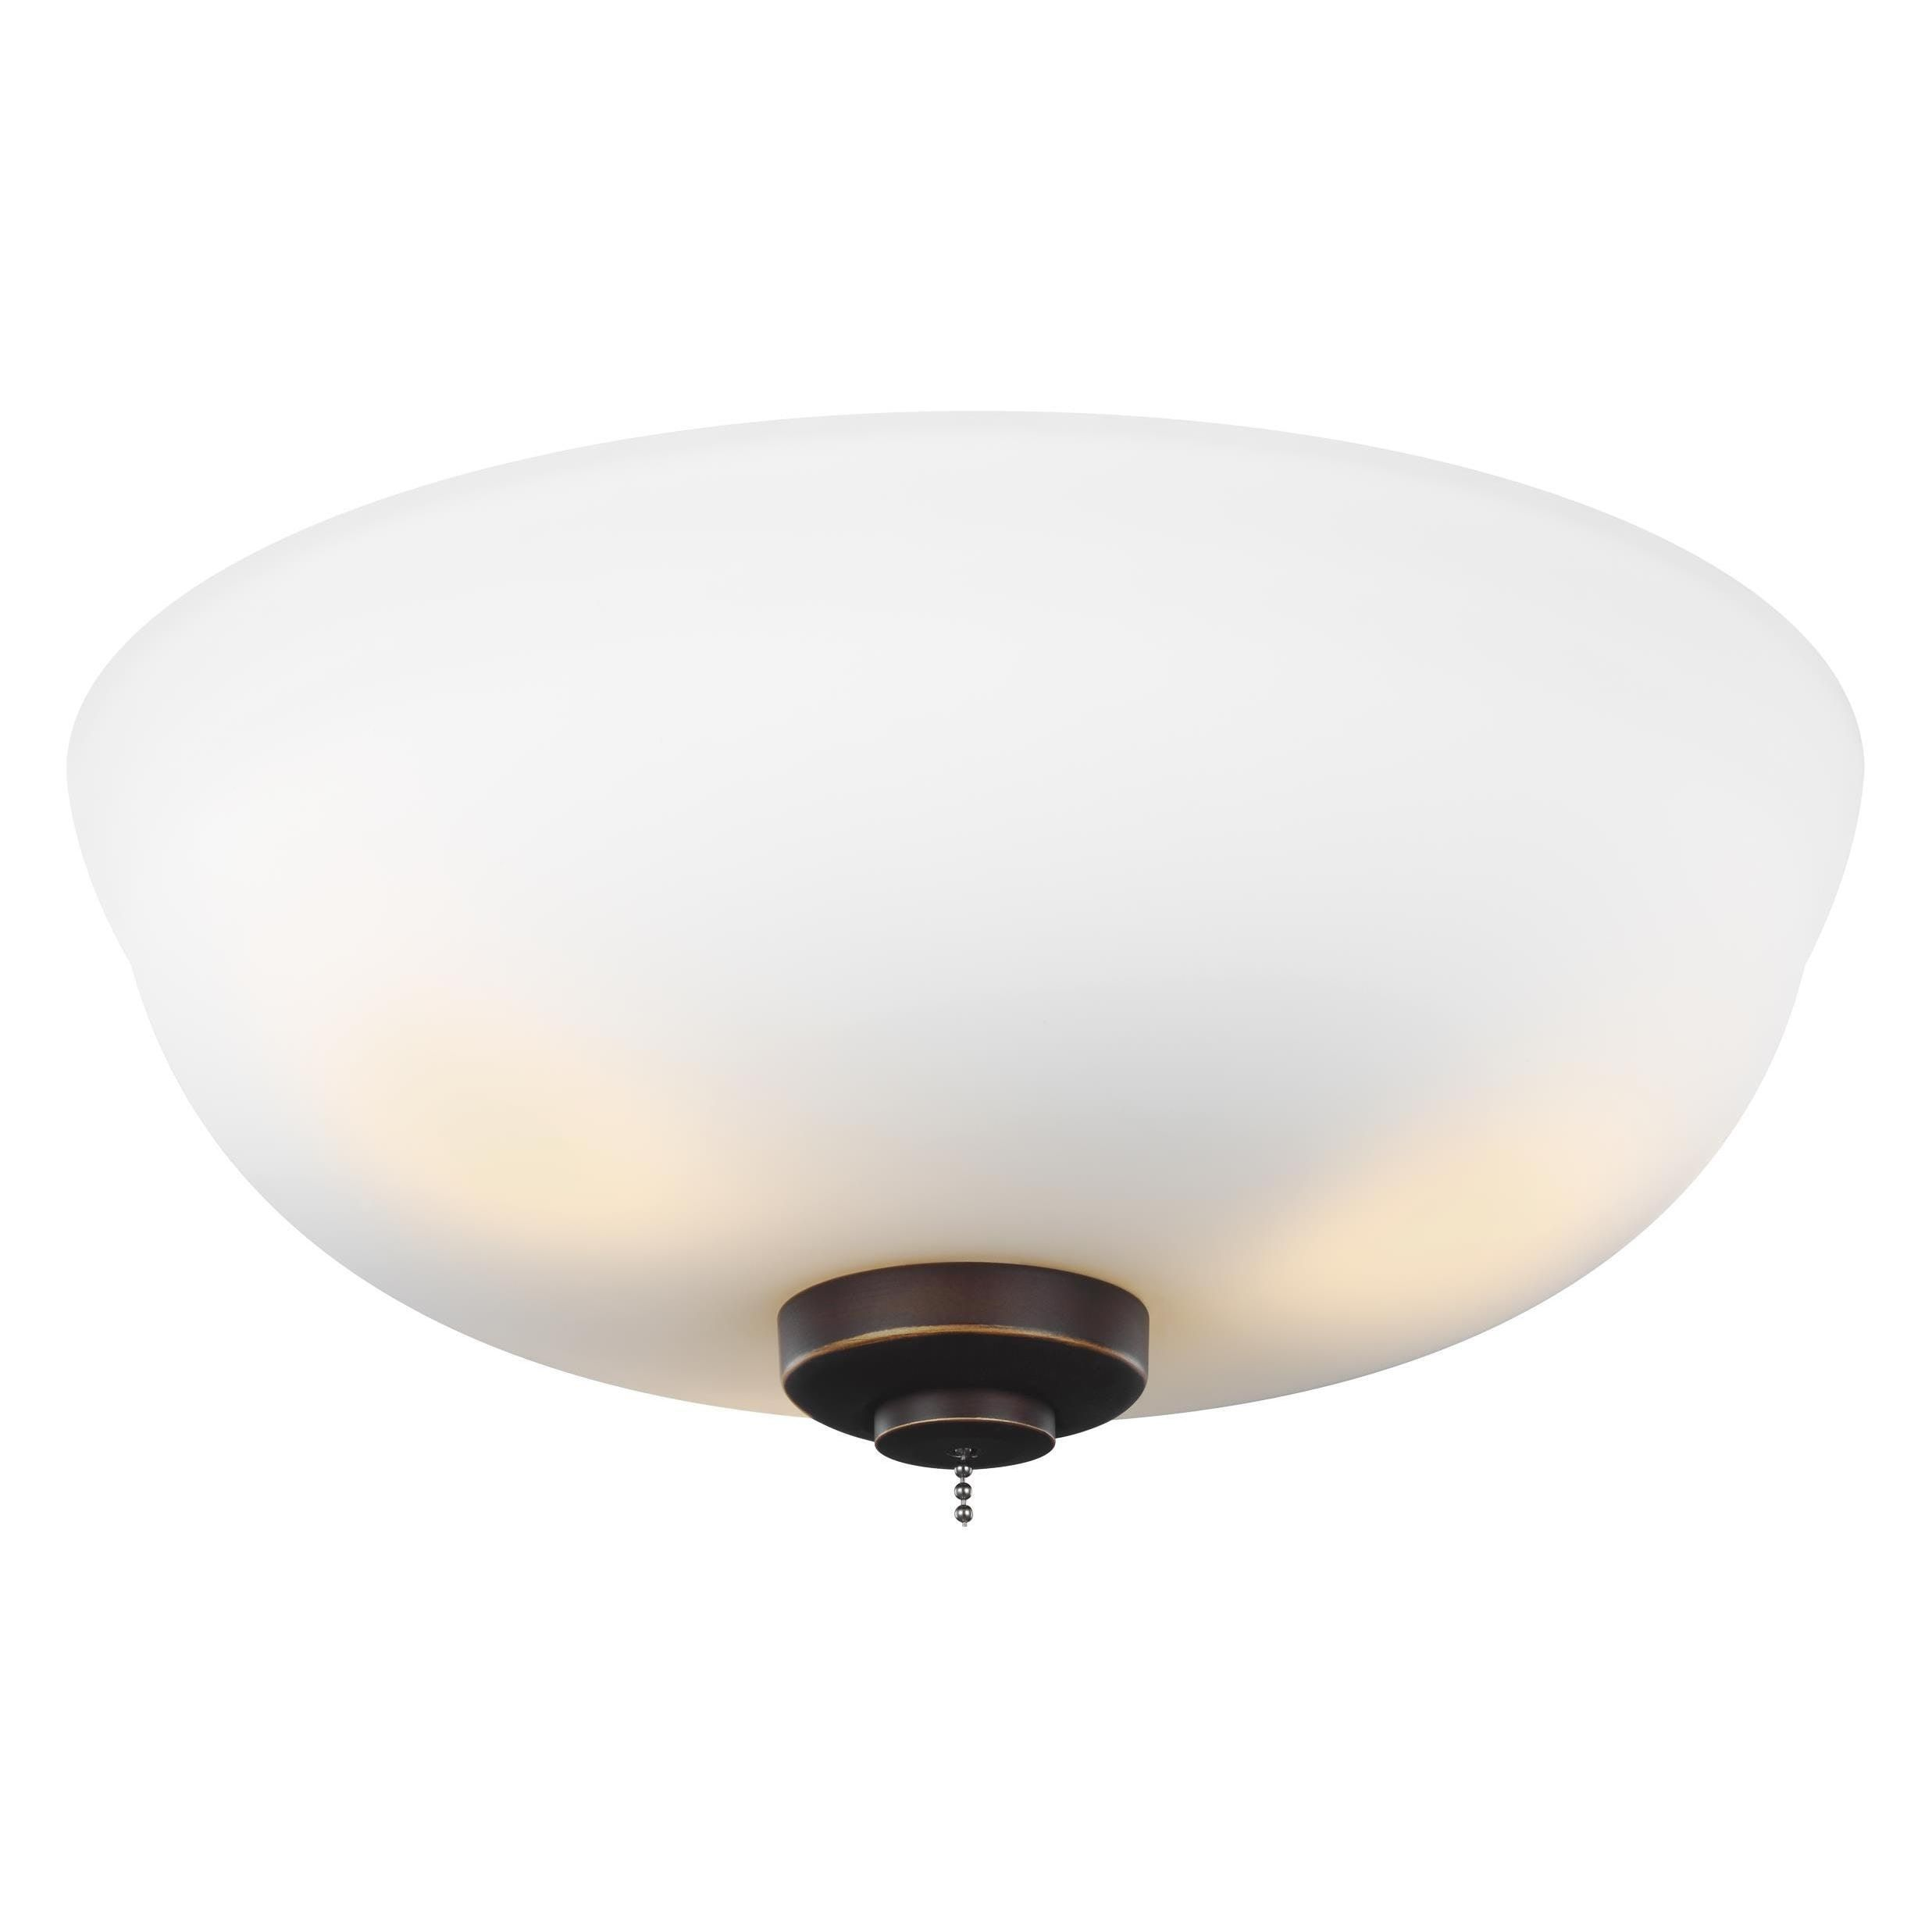 Monte Carlo 3 light Roman Bronze Ceiling Fan Light Kit 3 Light